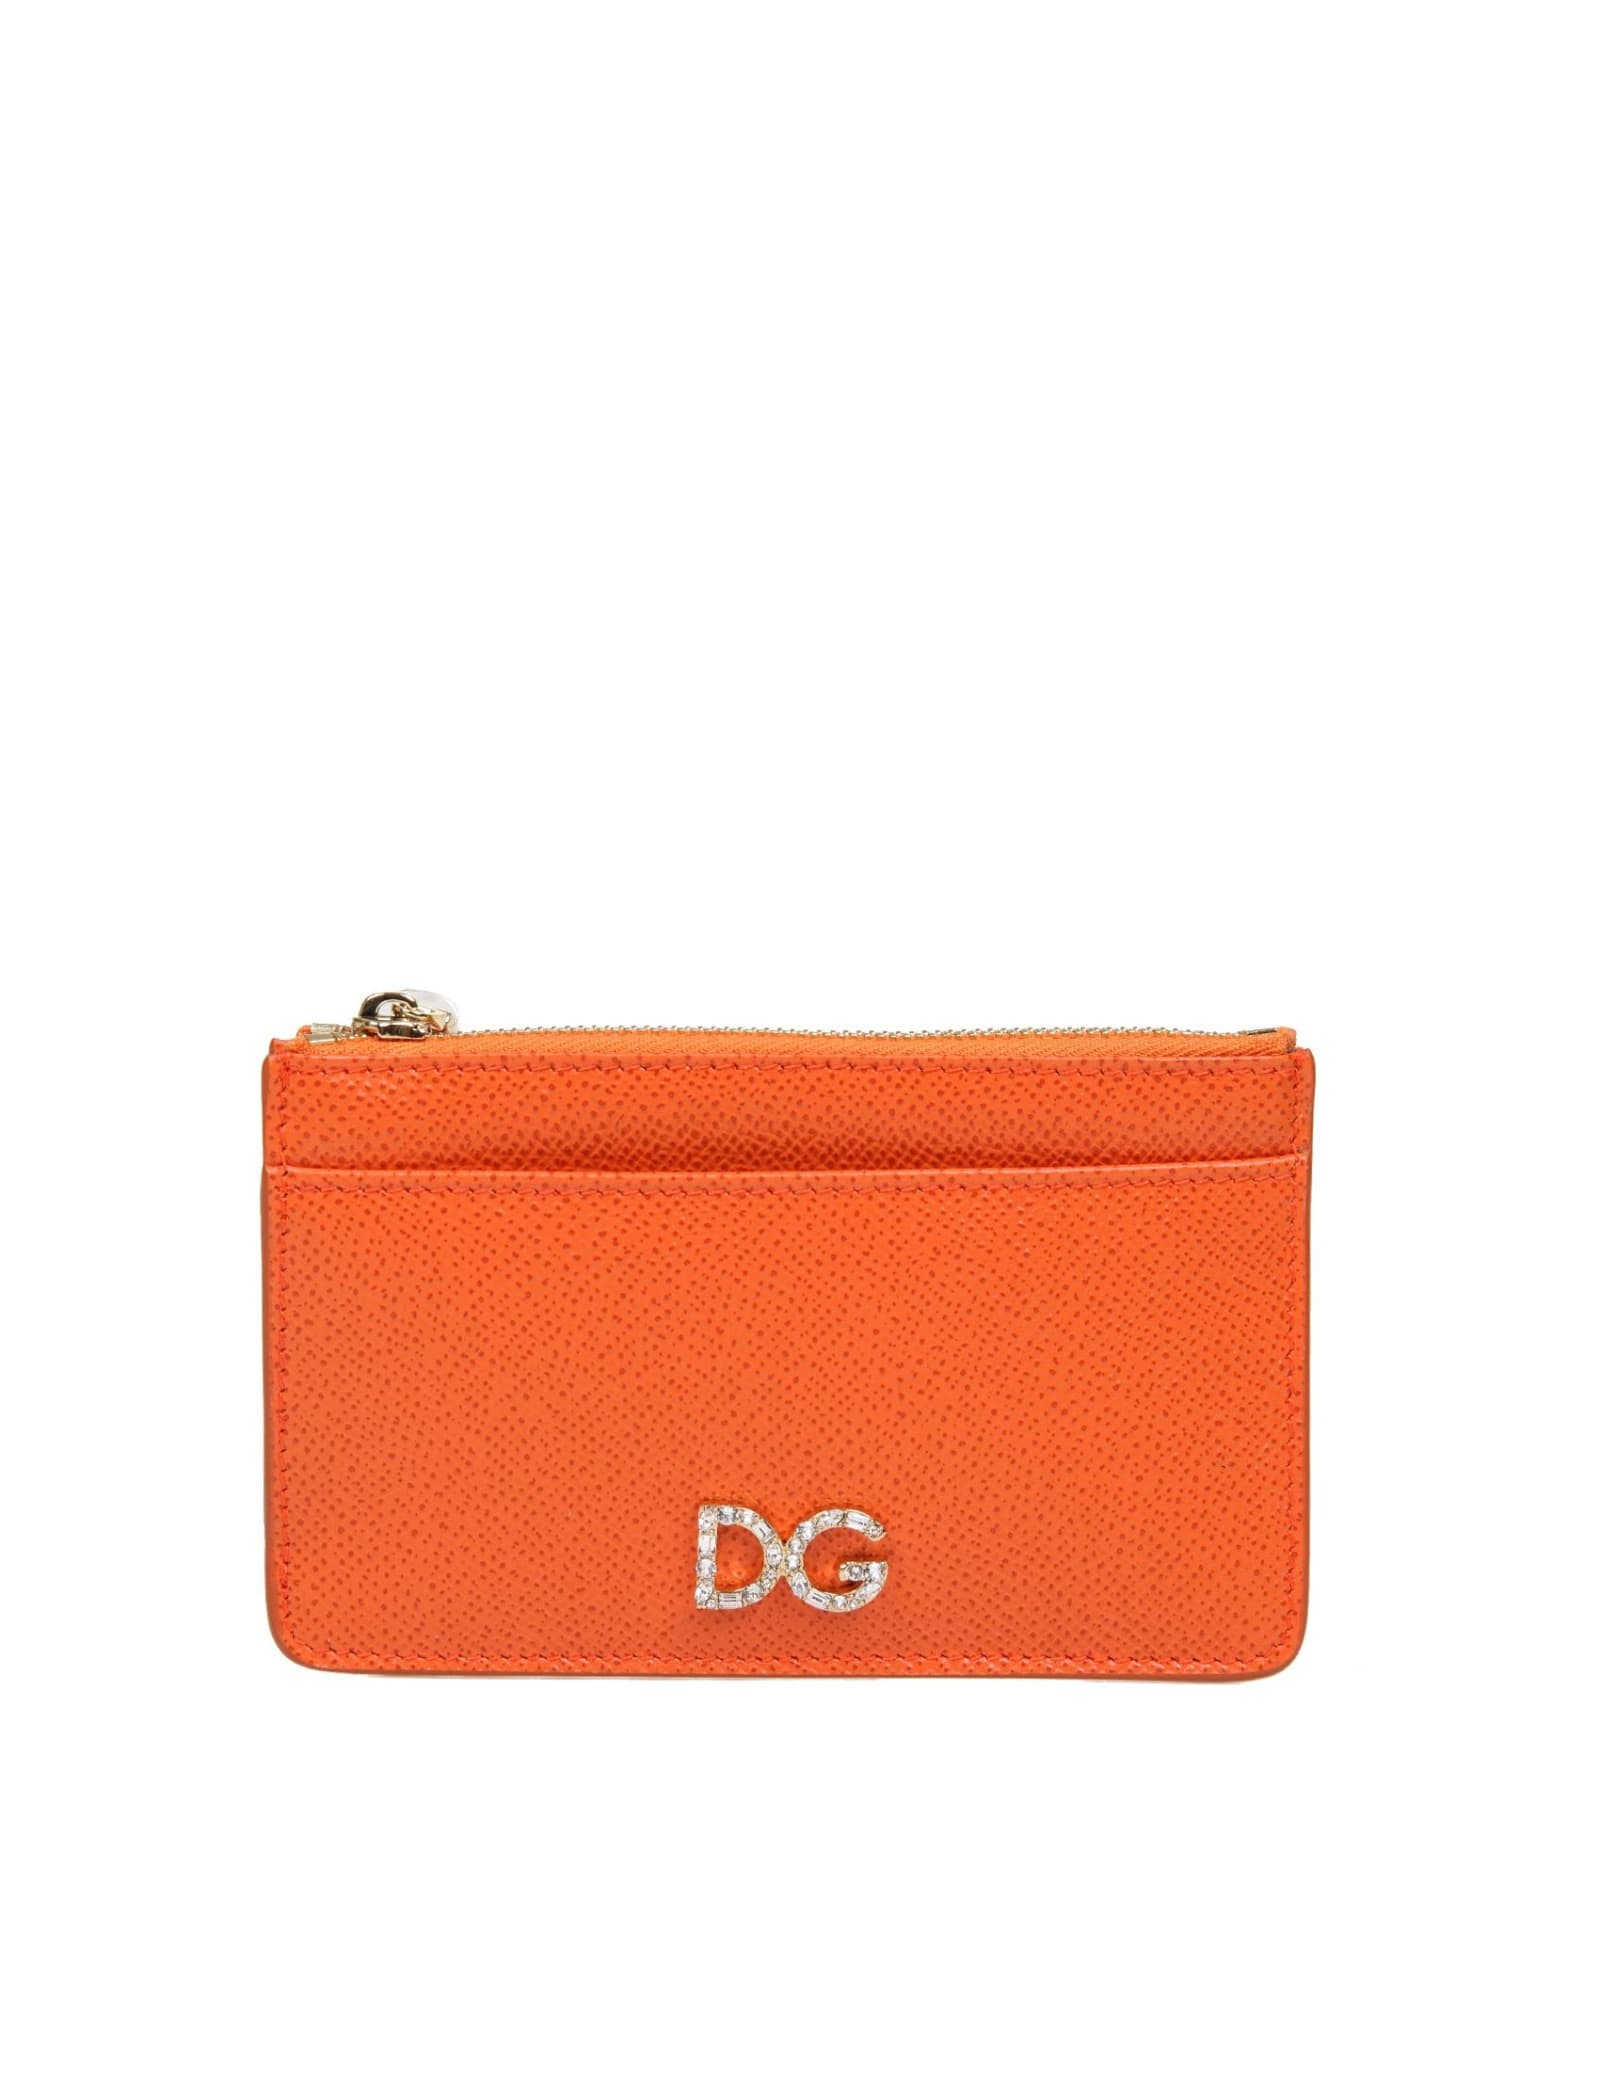 Dolce & Gabbana CARD HOLDER IN ORANGE COLOR DAUPHINE